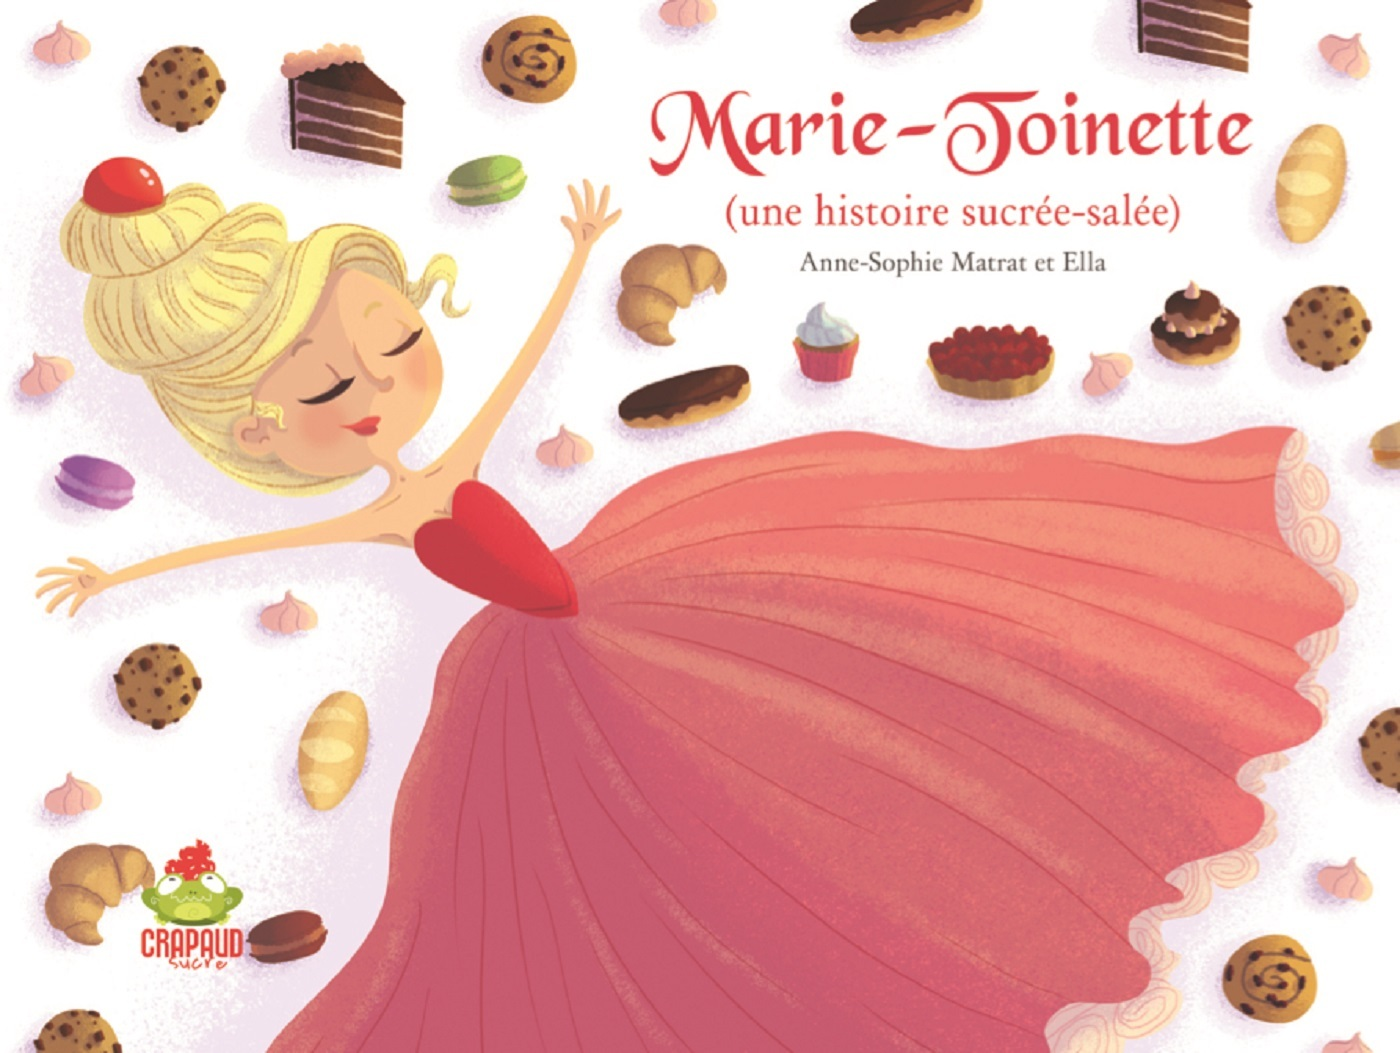 MARIE-TOINETTE UNE HISTOIRE SUCREE-SALEE